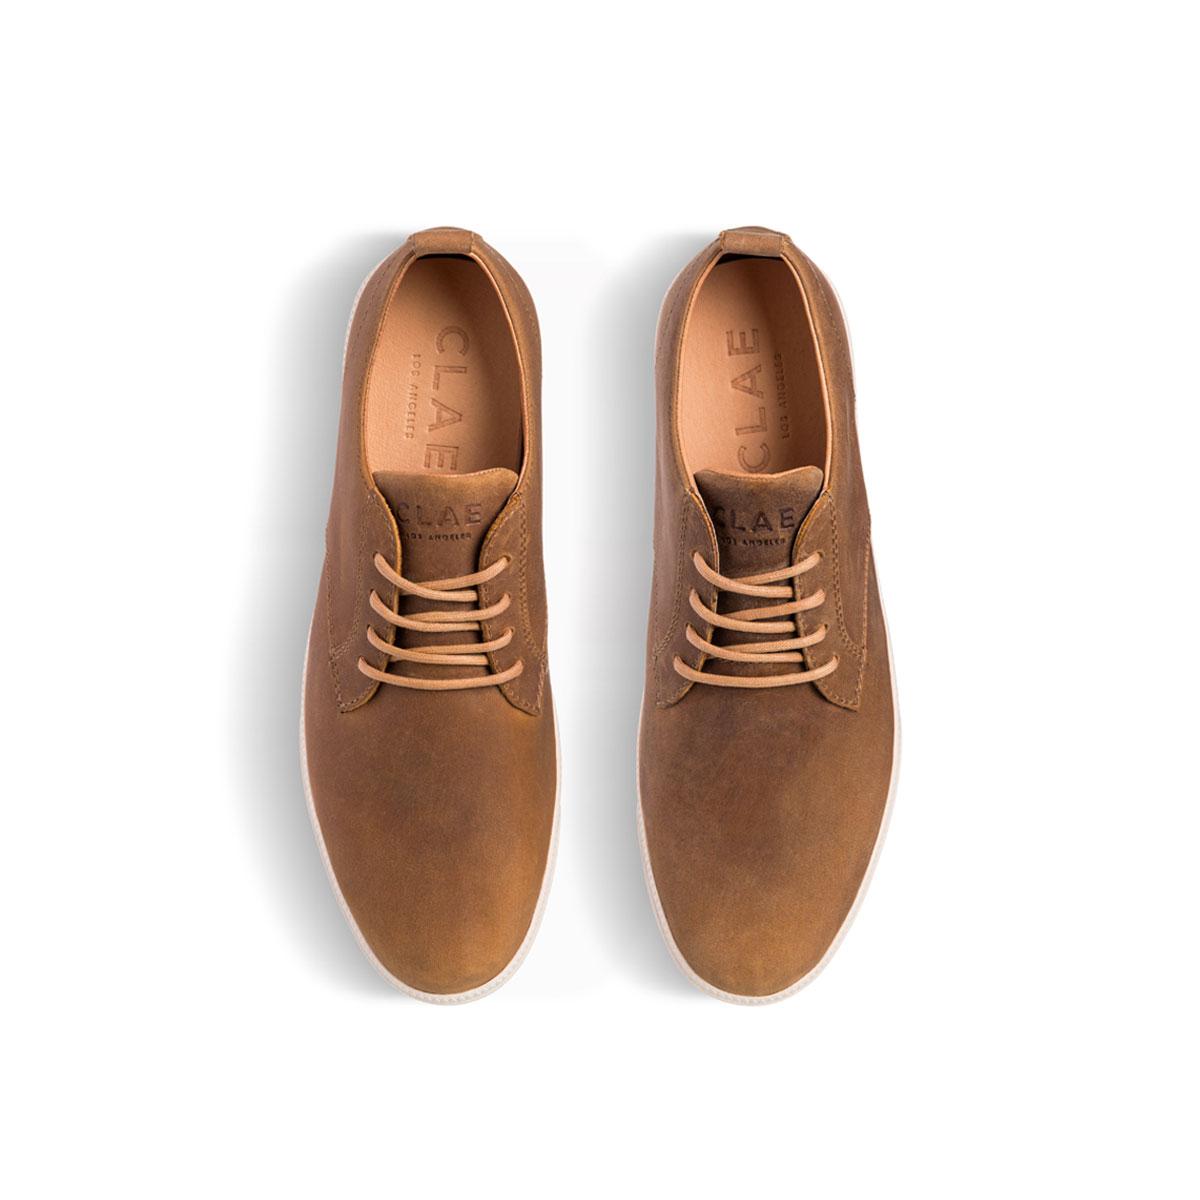 Ellington HICHORY leather